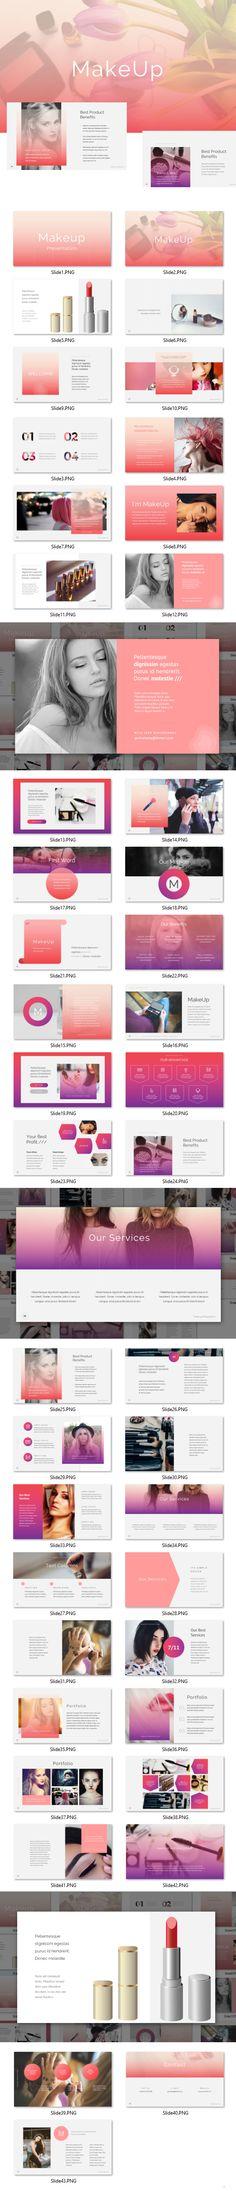 Makeup - PowerPoint Template